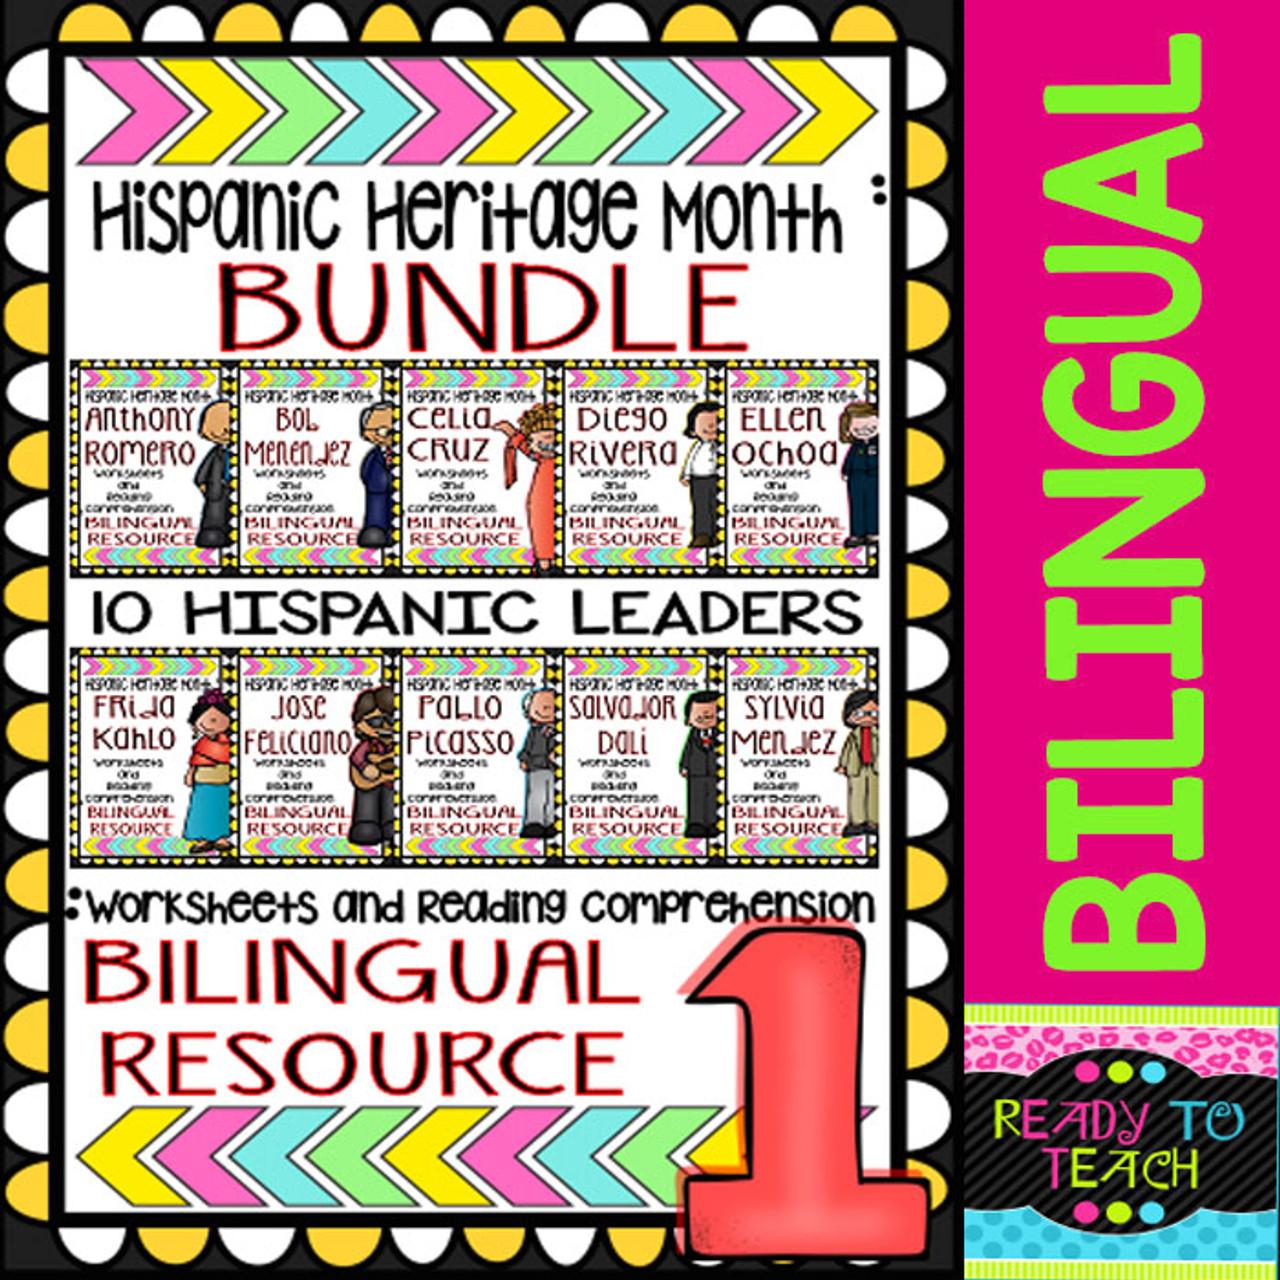 Hispanic Heritage Month - Bundle 1 - Worksheets and Readings (Bilingual)